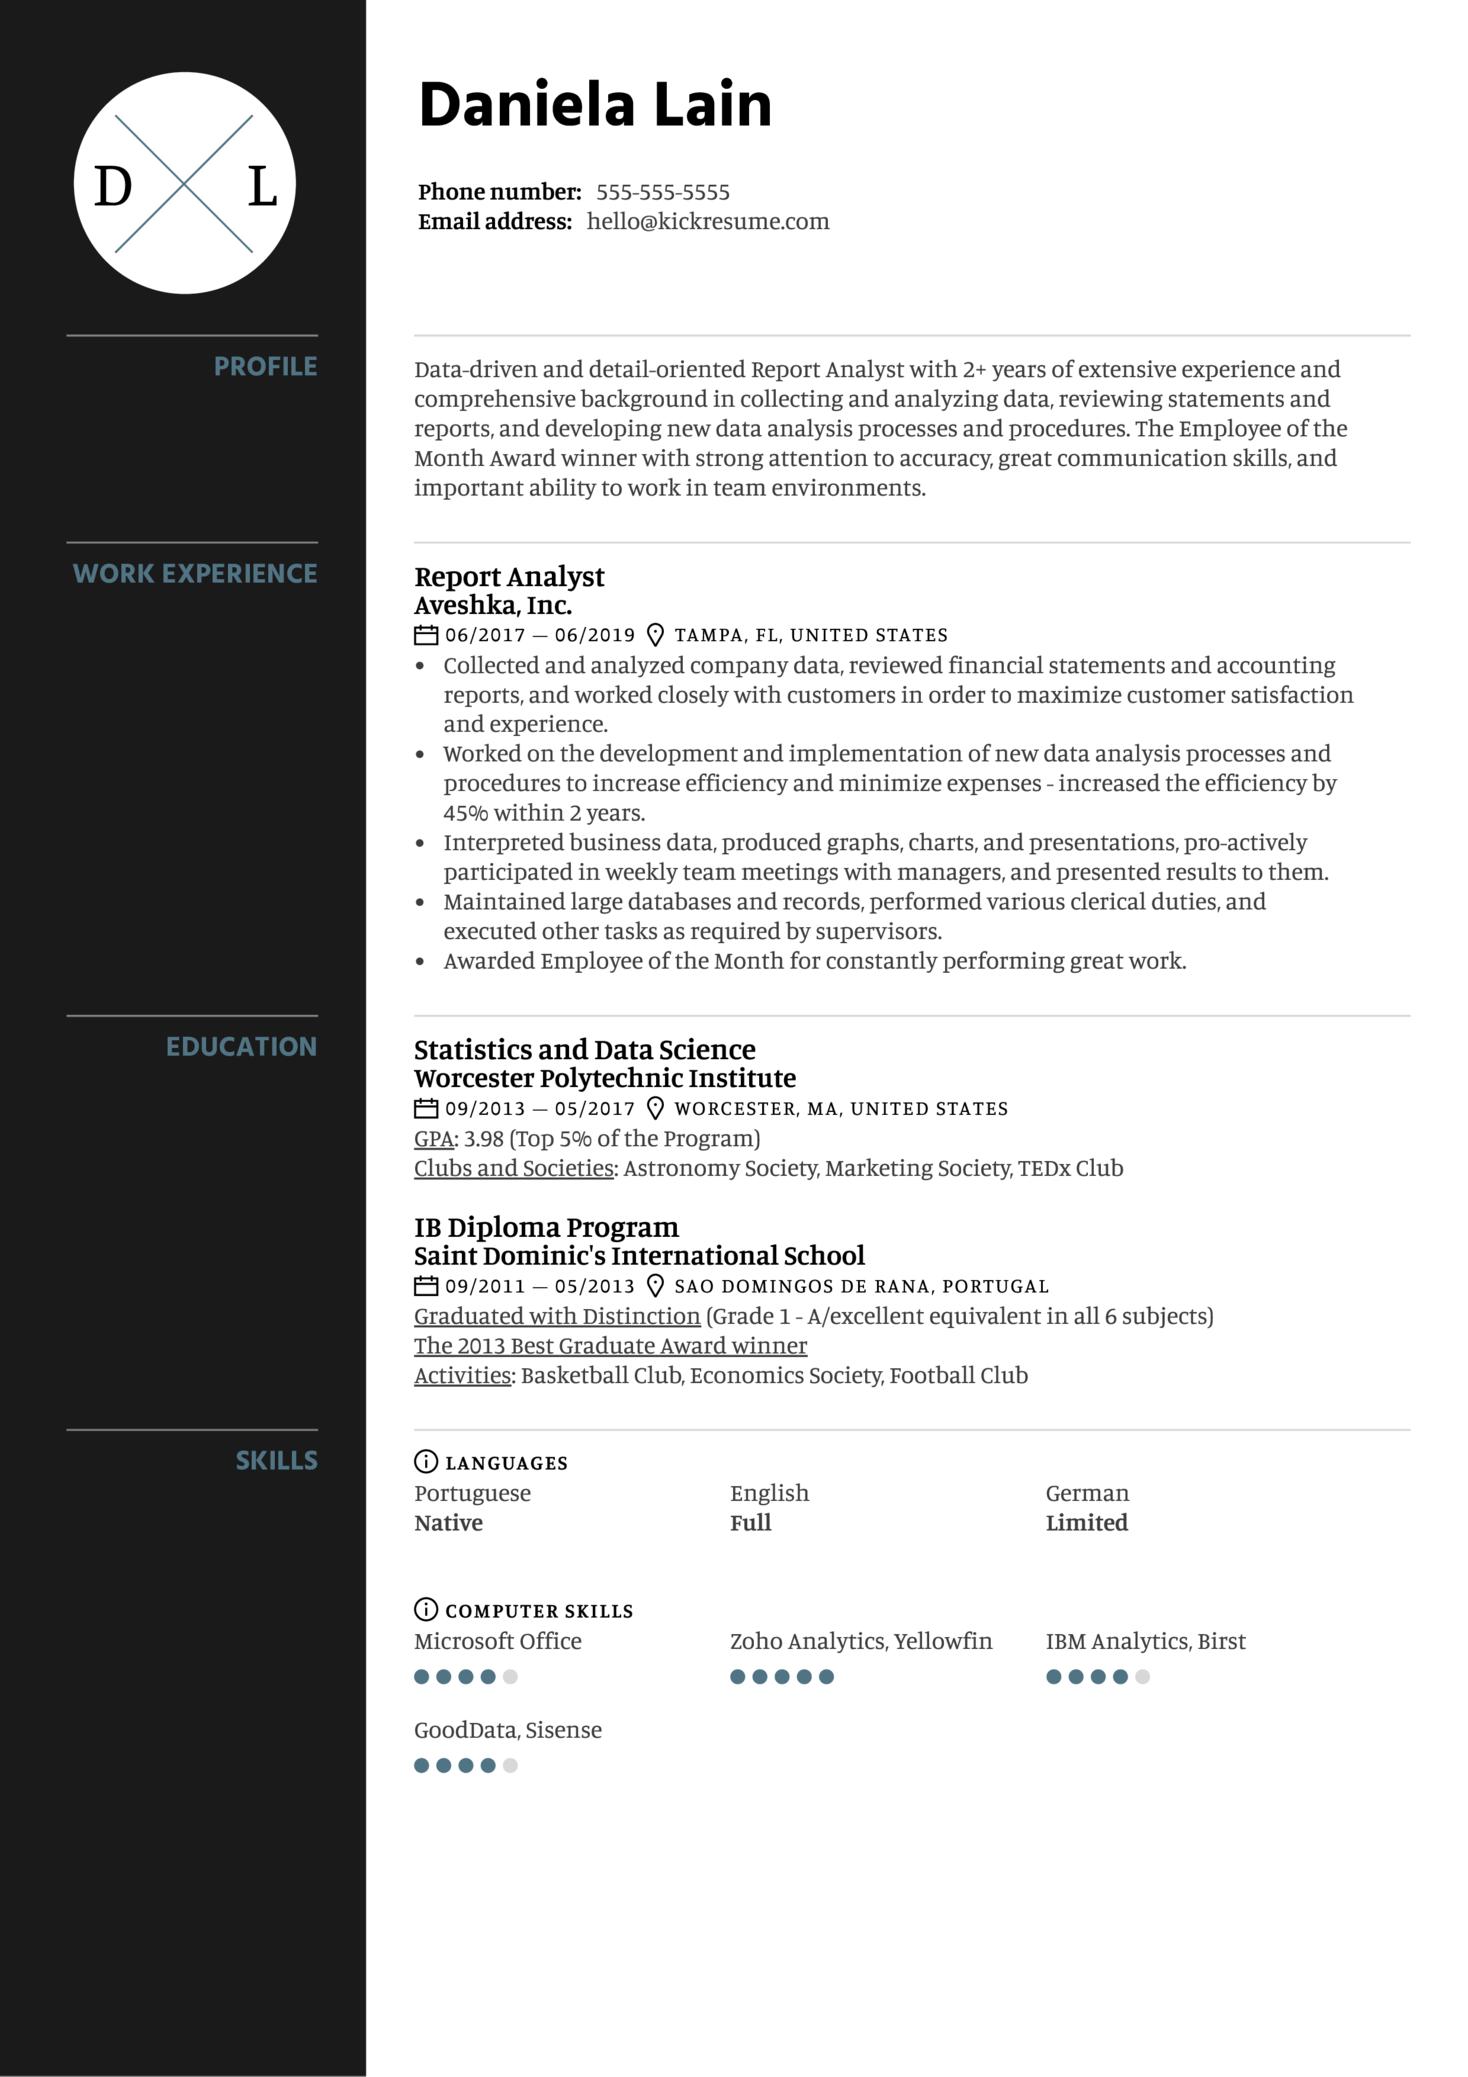 Report Analyst Resume Sample (Part 1)